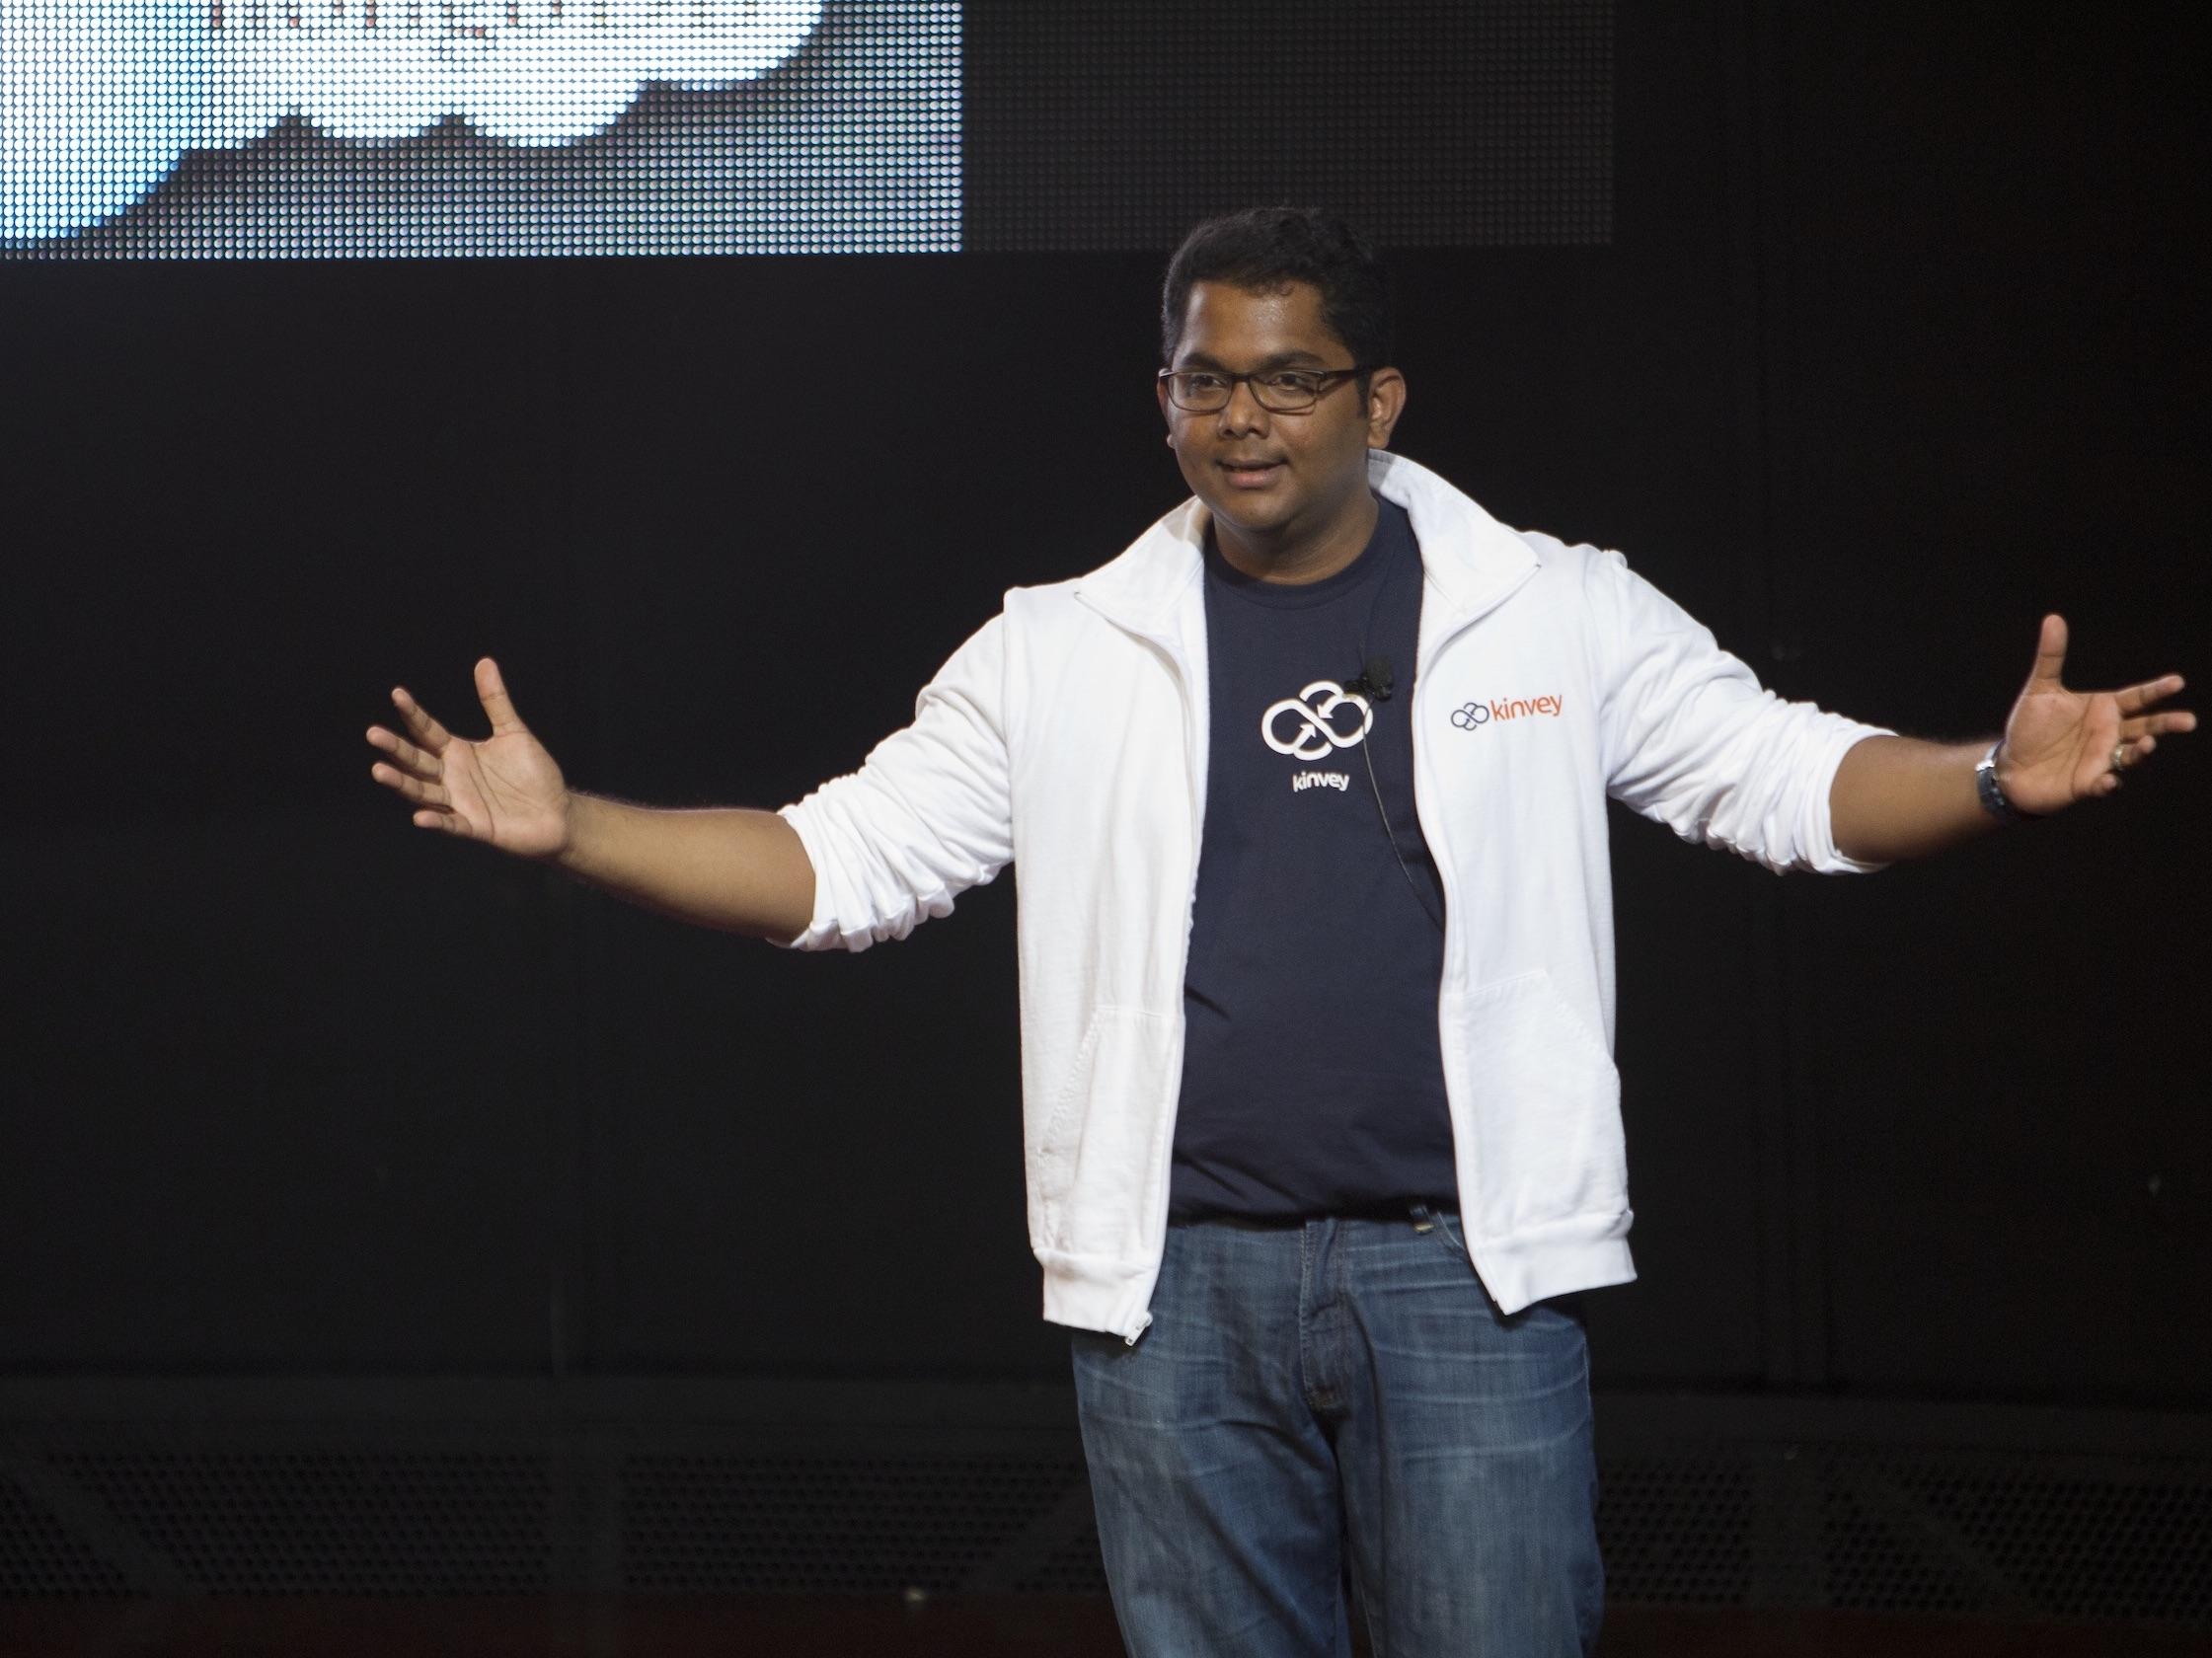 Kinvey CEO Sravish Sridhar